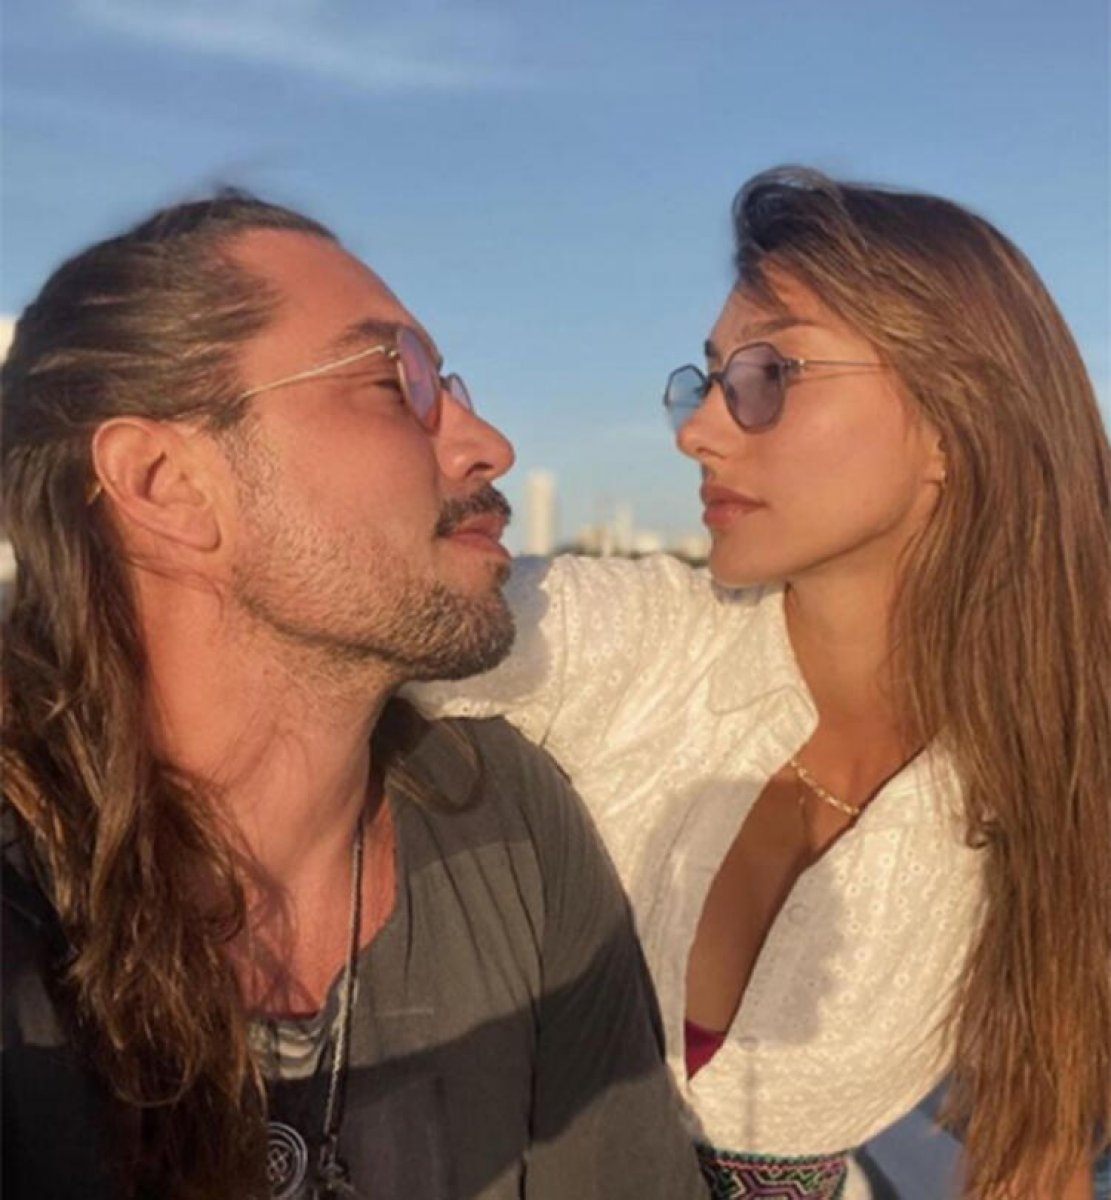 Miss Turkey Kimdir Bayan Şevval Şahin?  Sevgilisi Yiğit Marcus Aral kimdir?  # 2nd